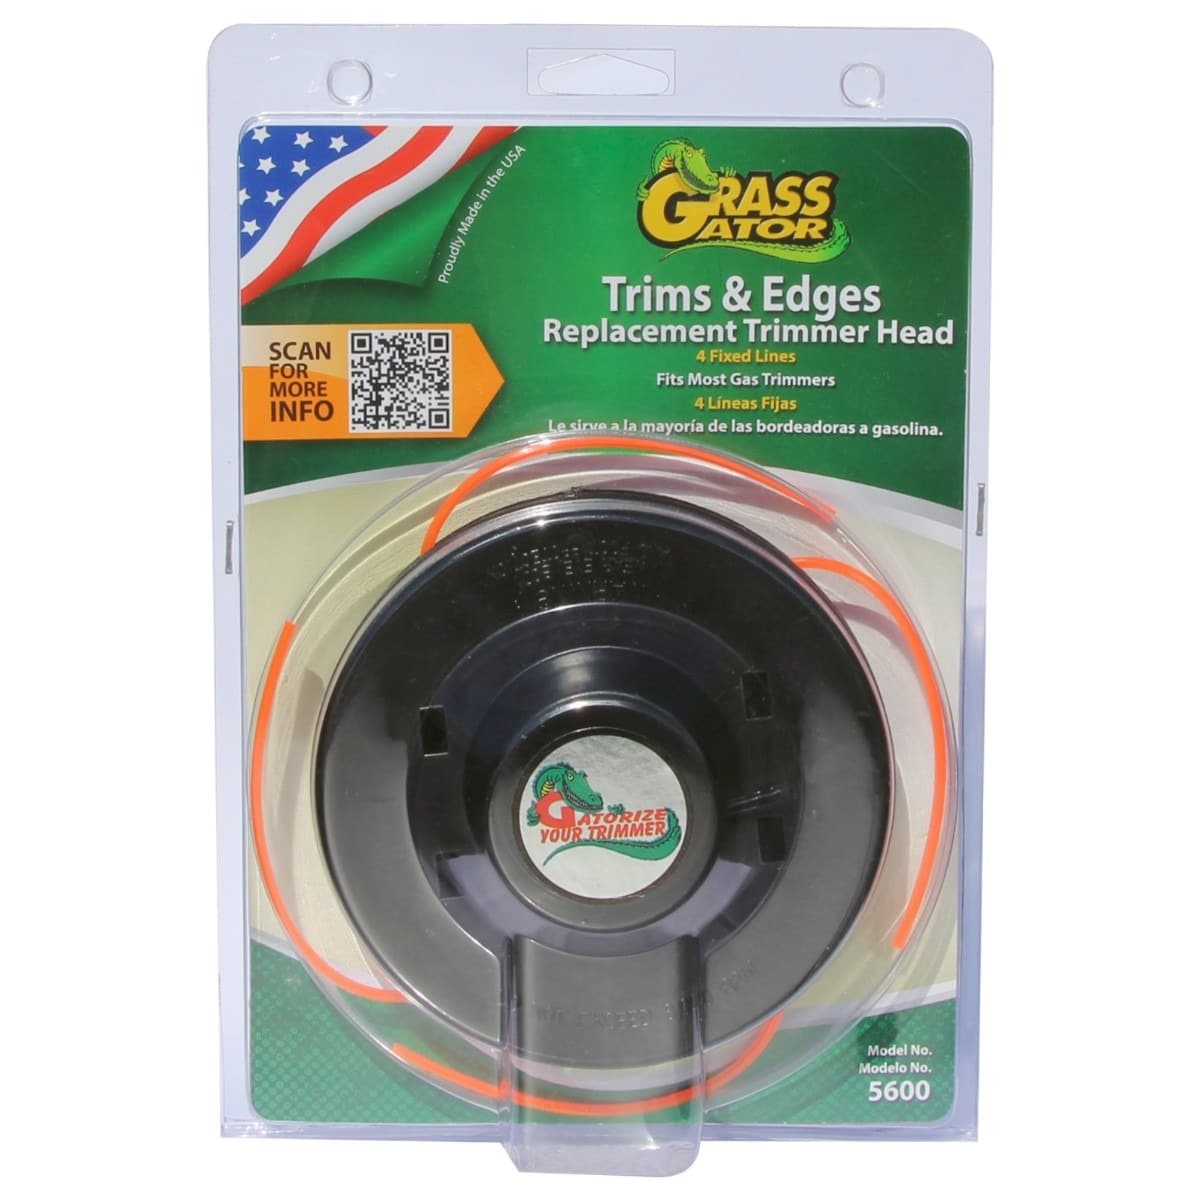 Grass Gator 5600-6 Grass Gator String Trimmer Replacement...